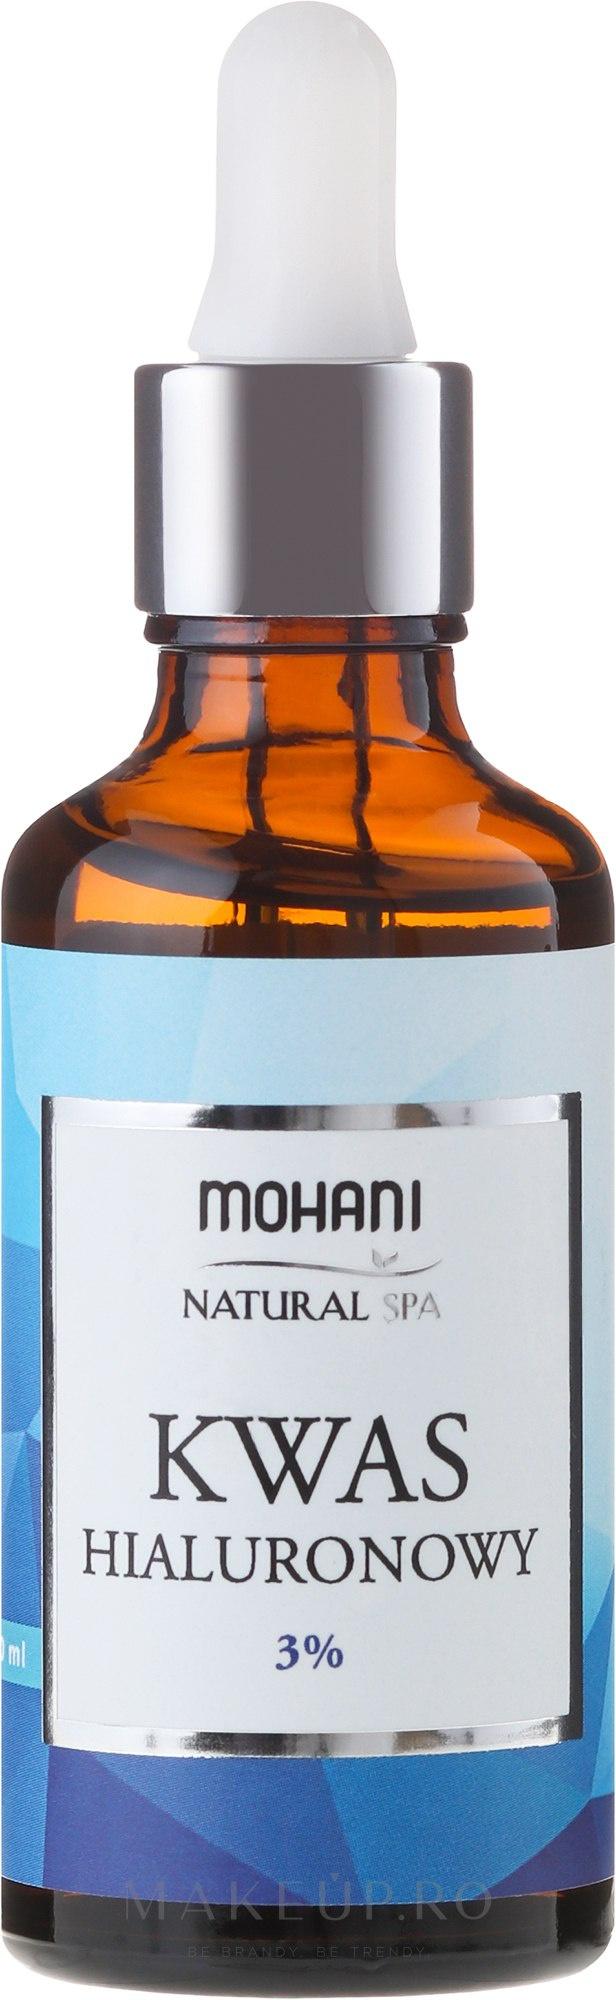 Mohani Triactive Hyaluronic Acid Gel 3%